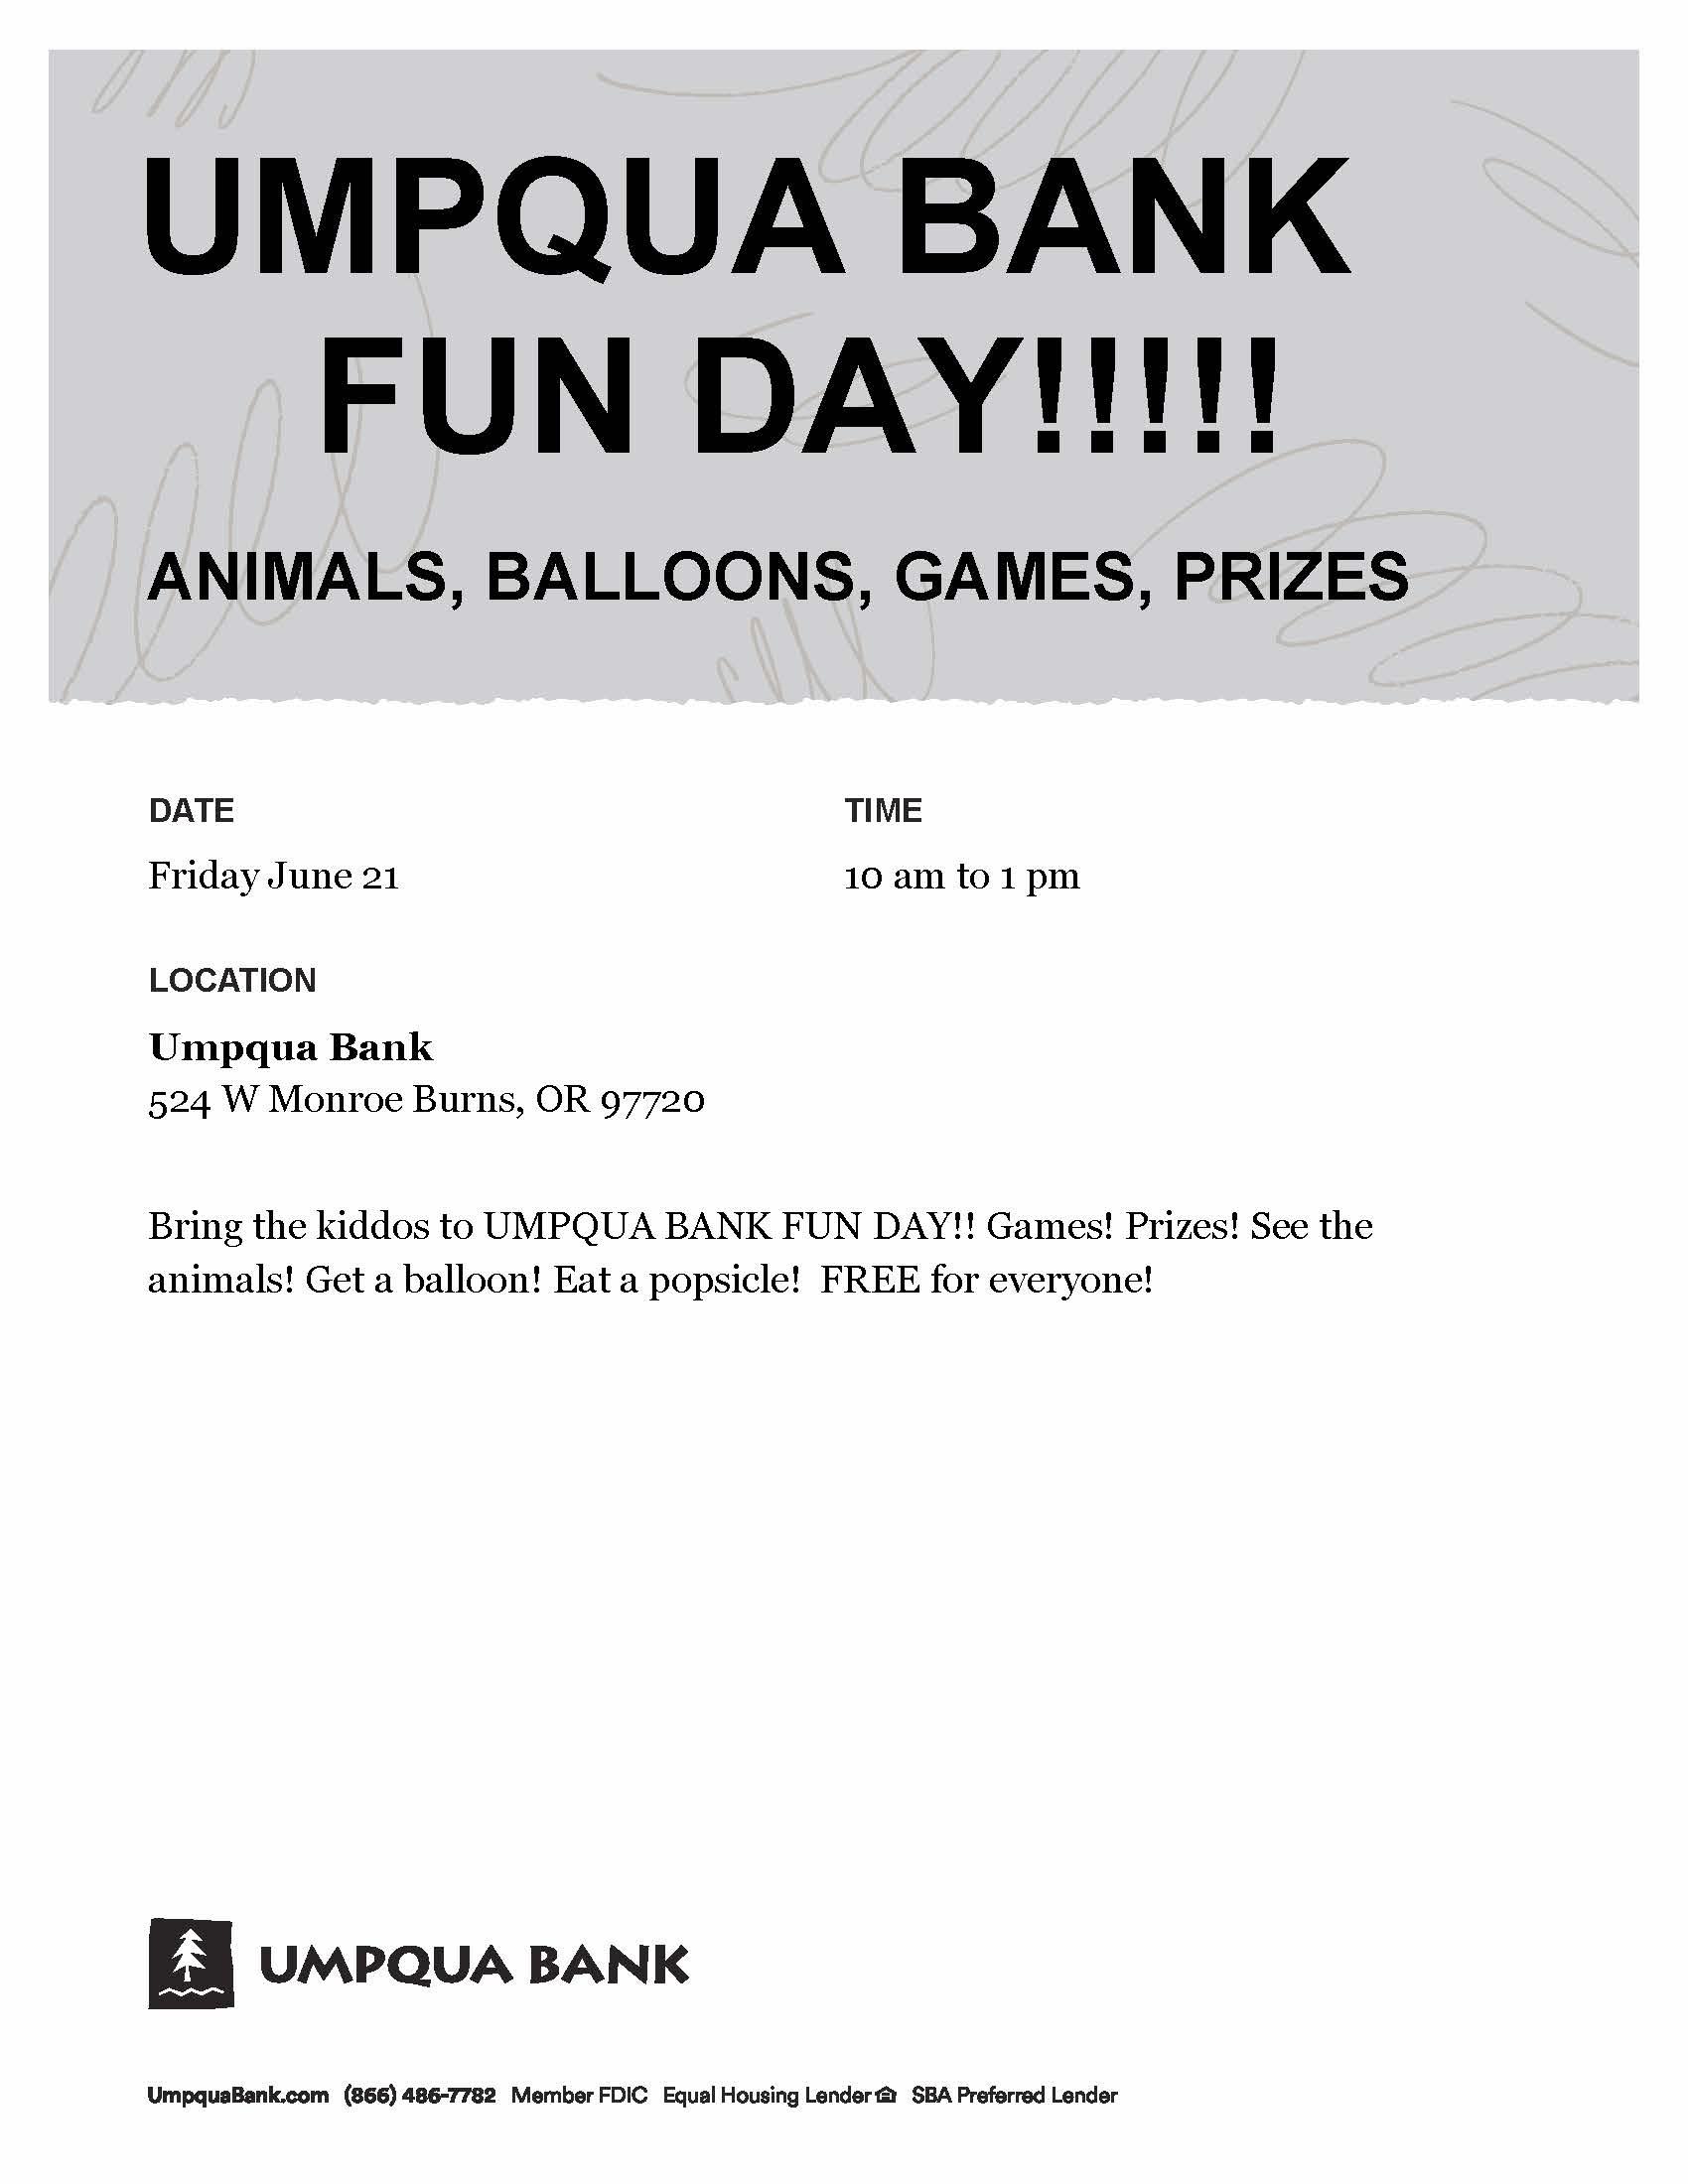 Umpqua Bank fun day flyer 2019.jpg